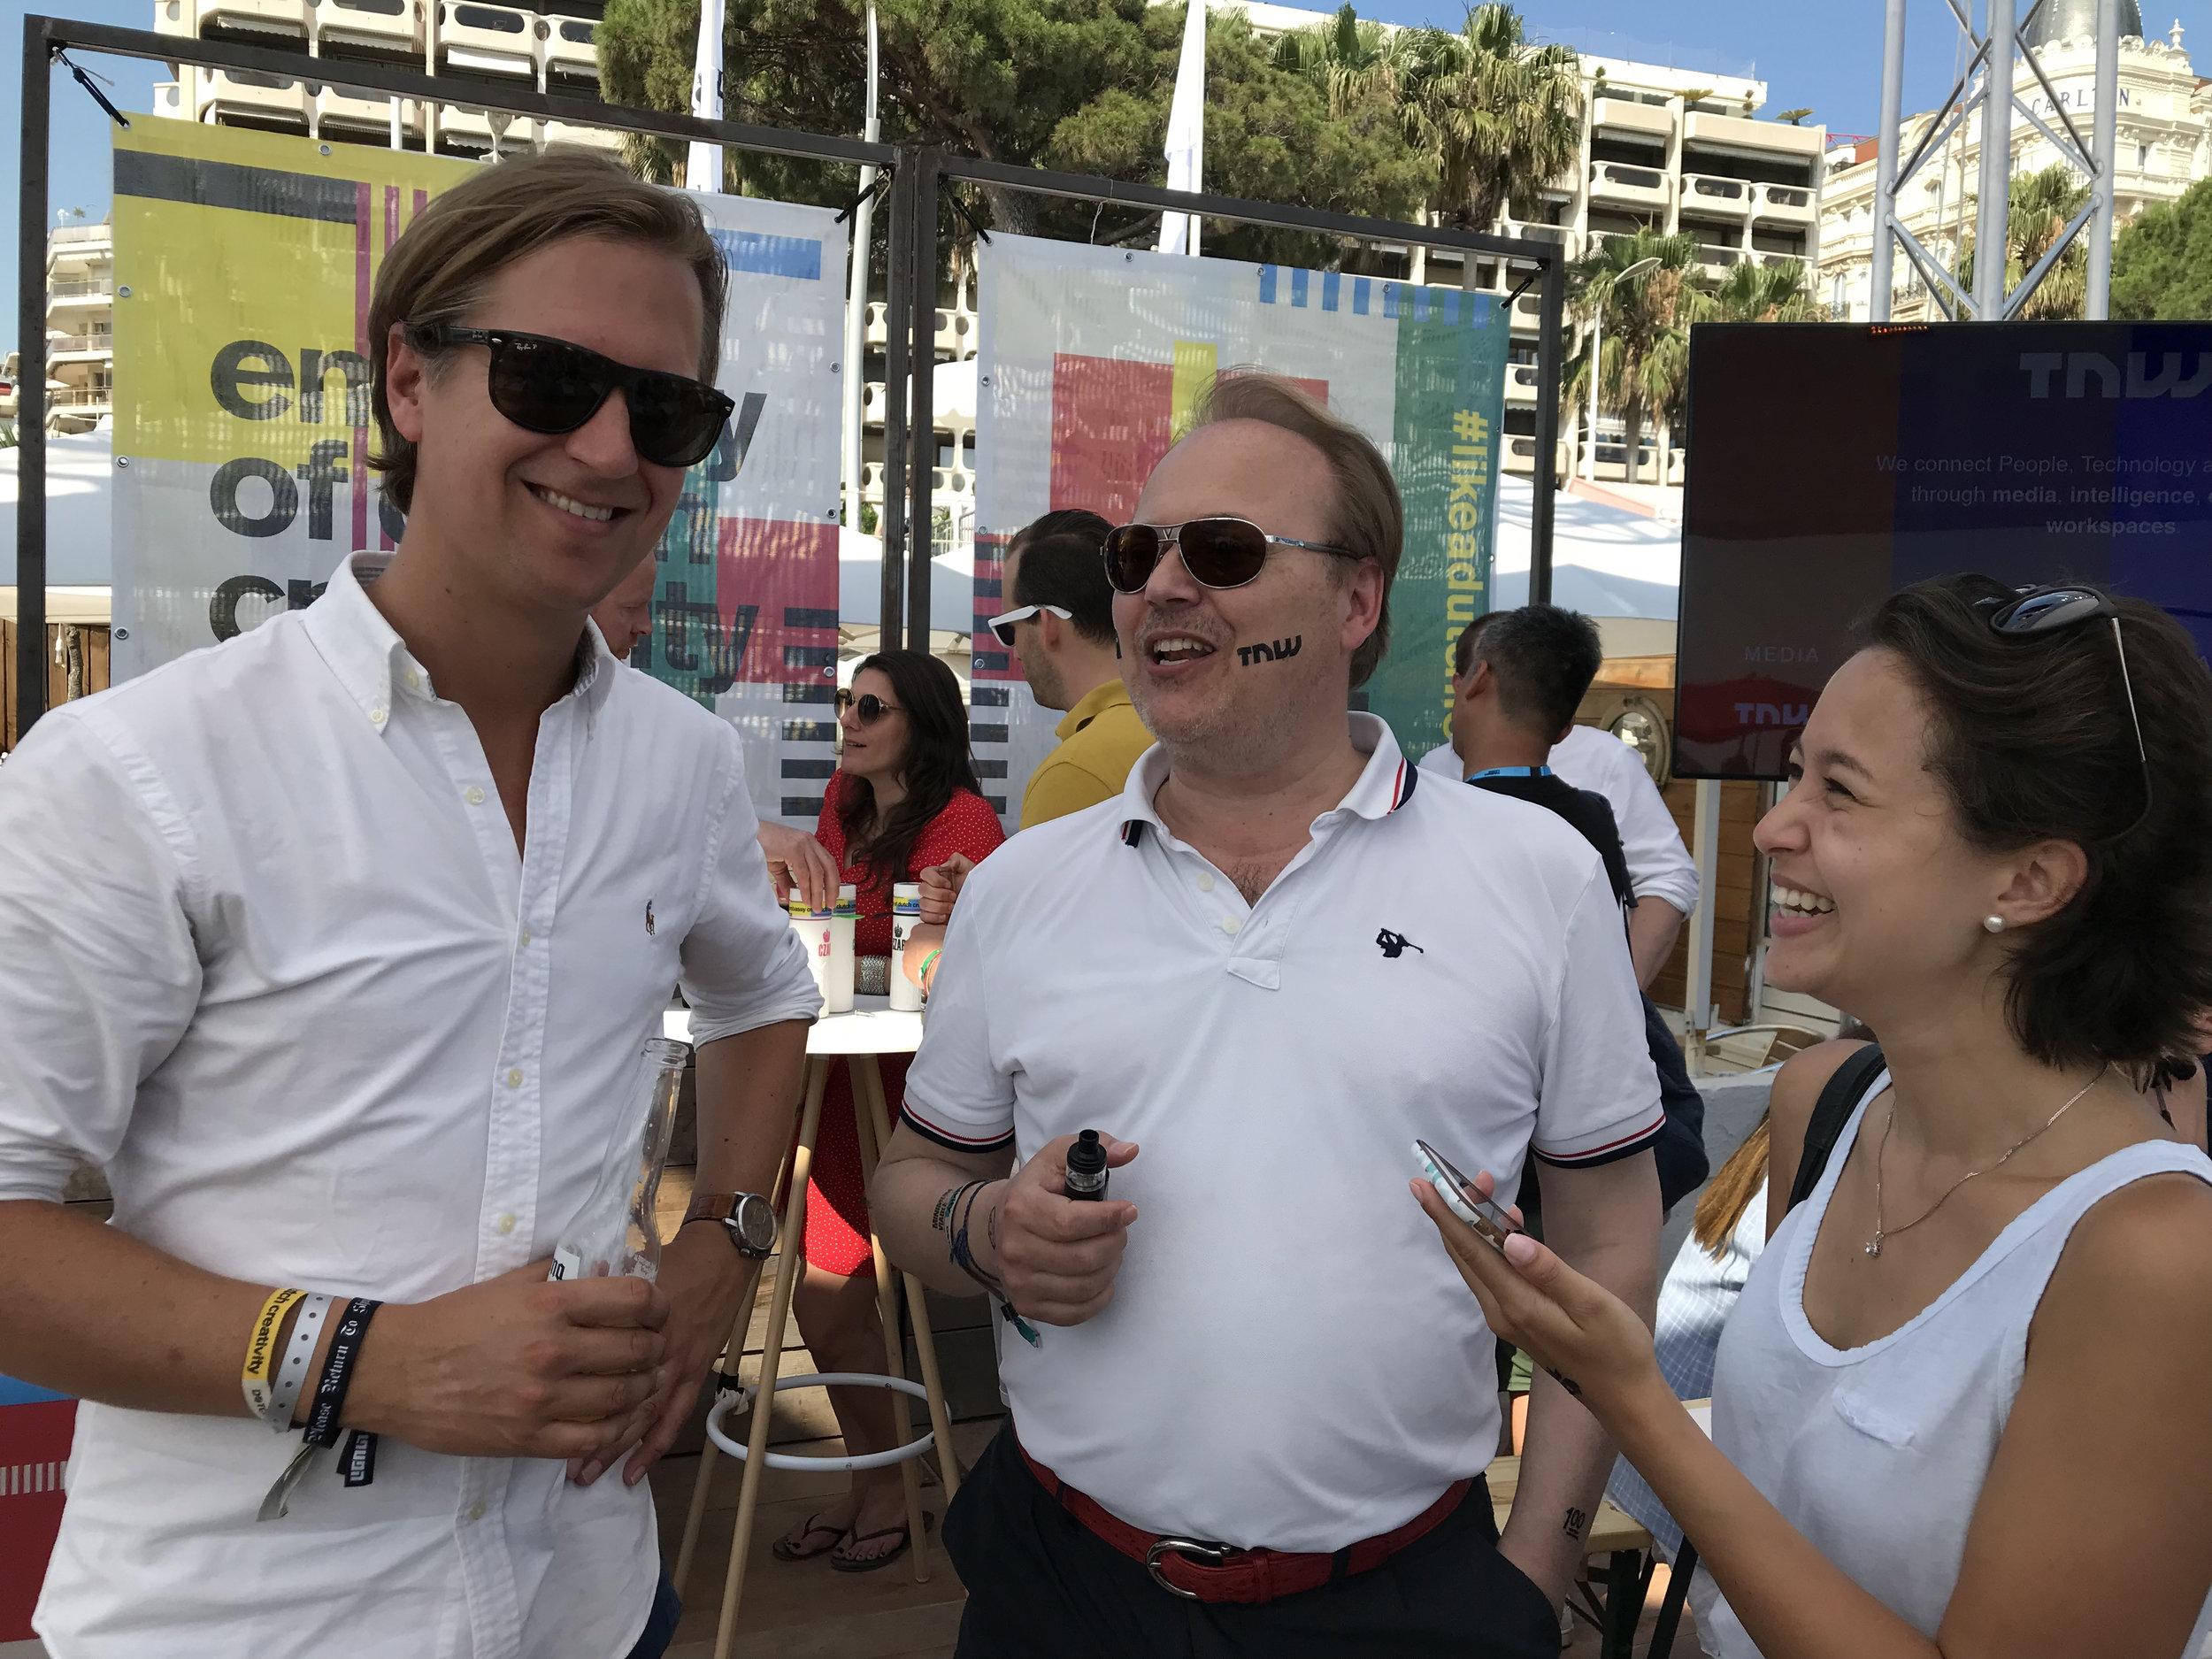 TNW Maarten Postma along with Christopher Mindus and Caroline Mindus